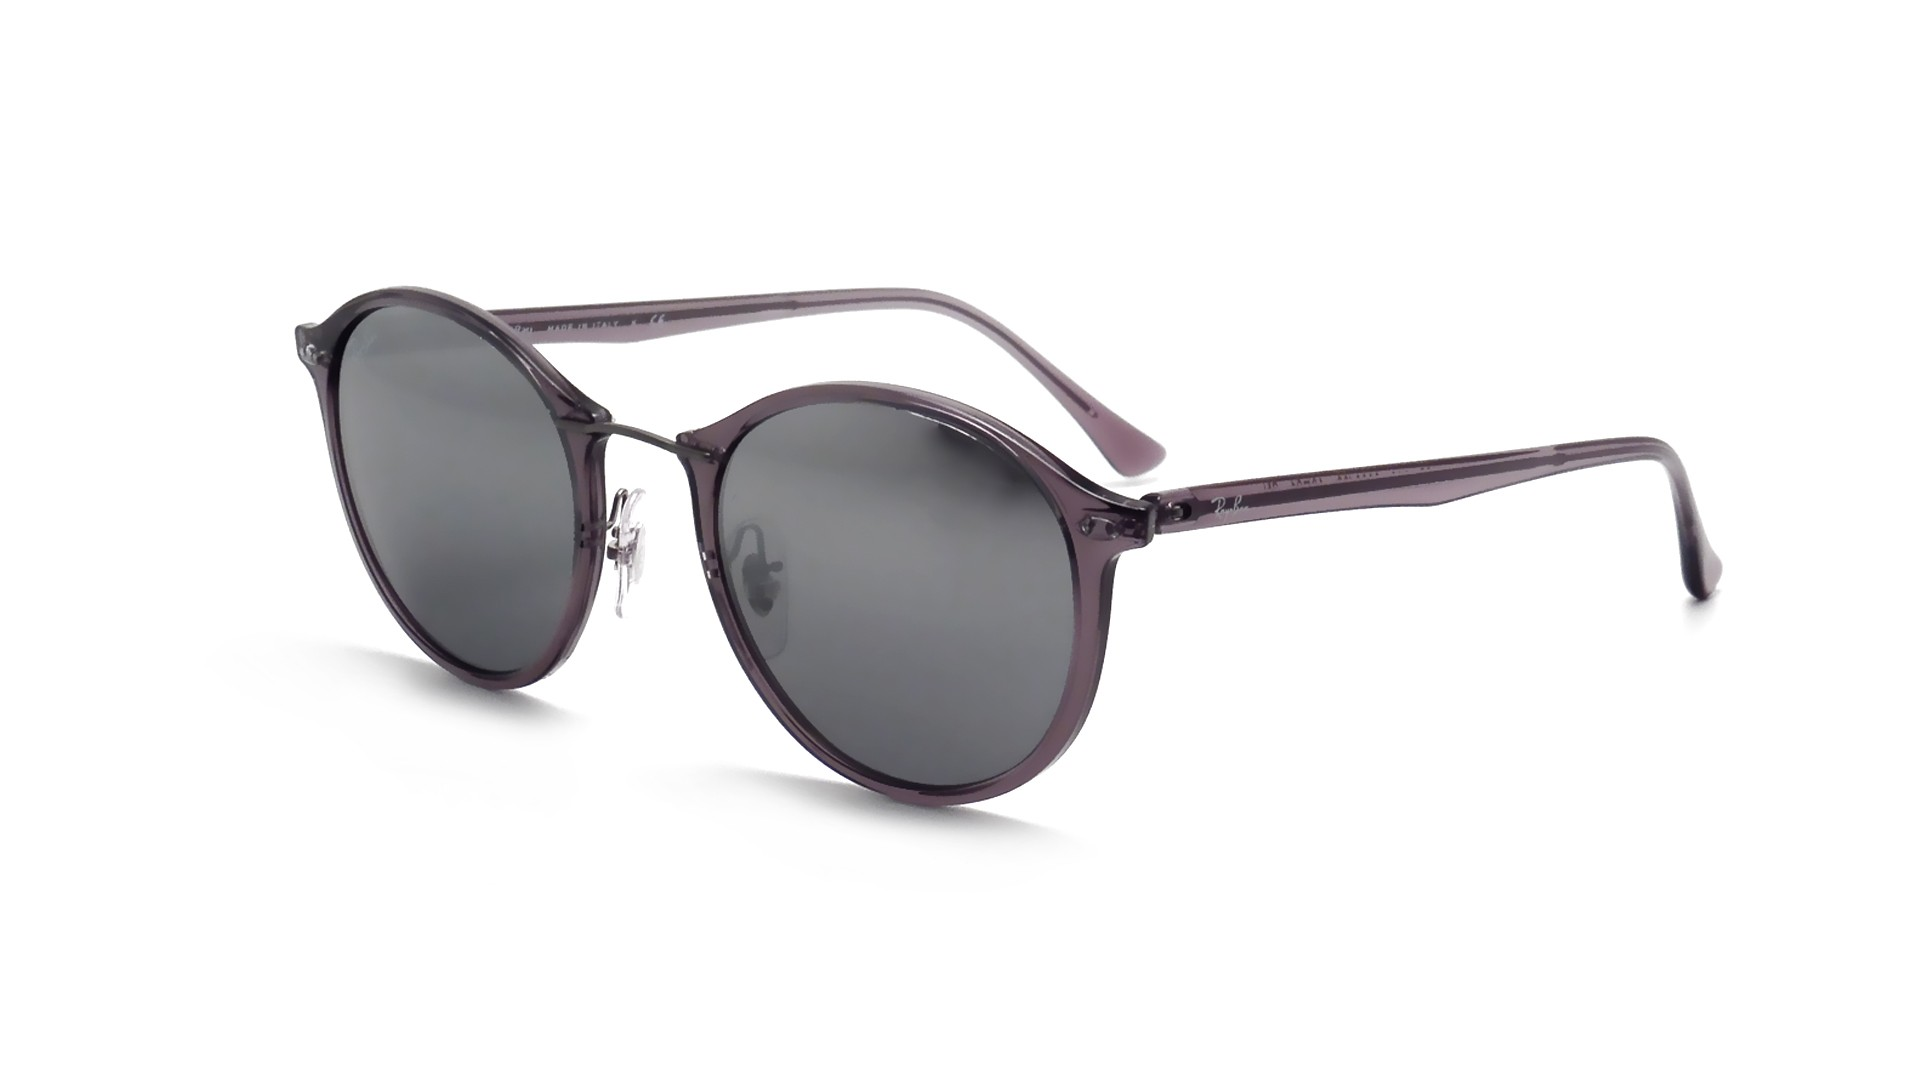 5718a0ae40 Sunglasses Ray-Ban Tech Light Ray Tech Grey RB4242 620088 49-21 Medium  Mirror